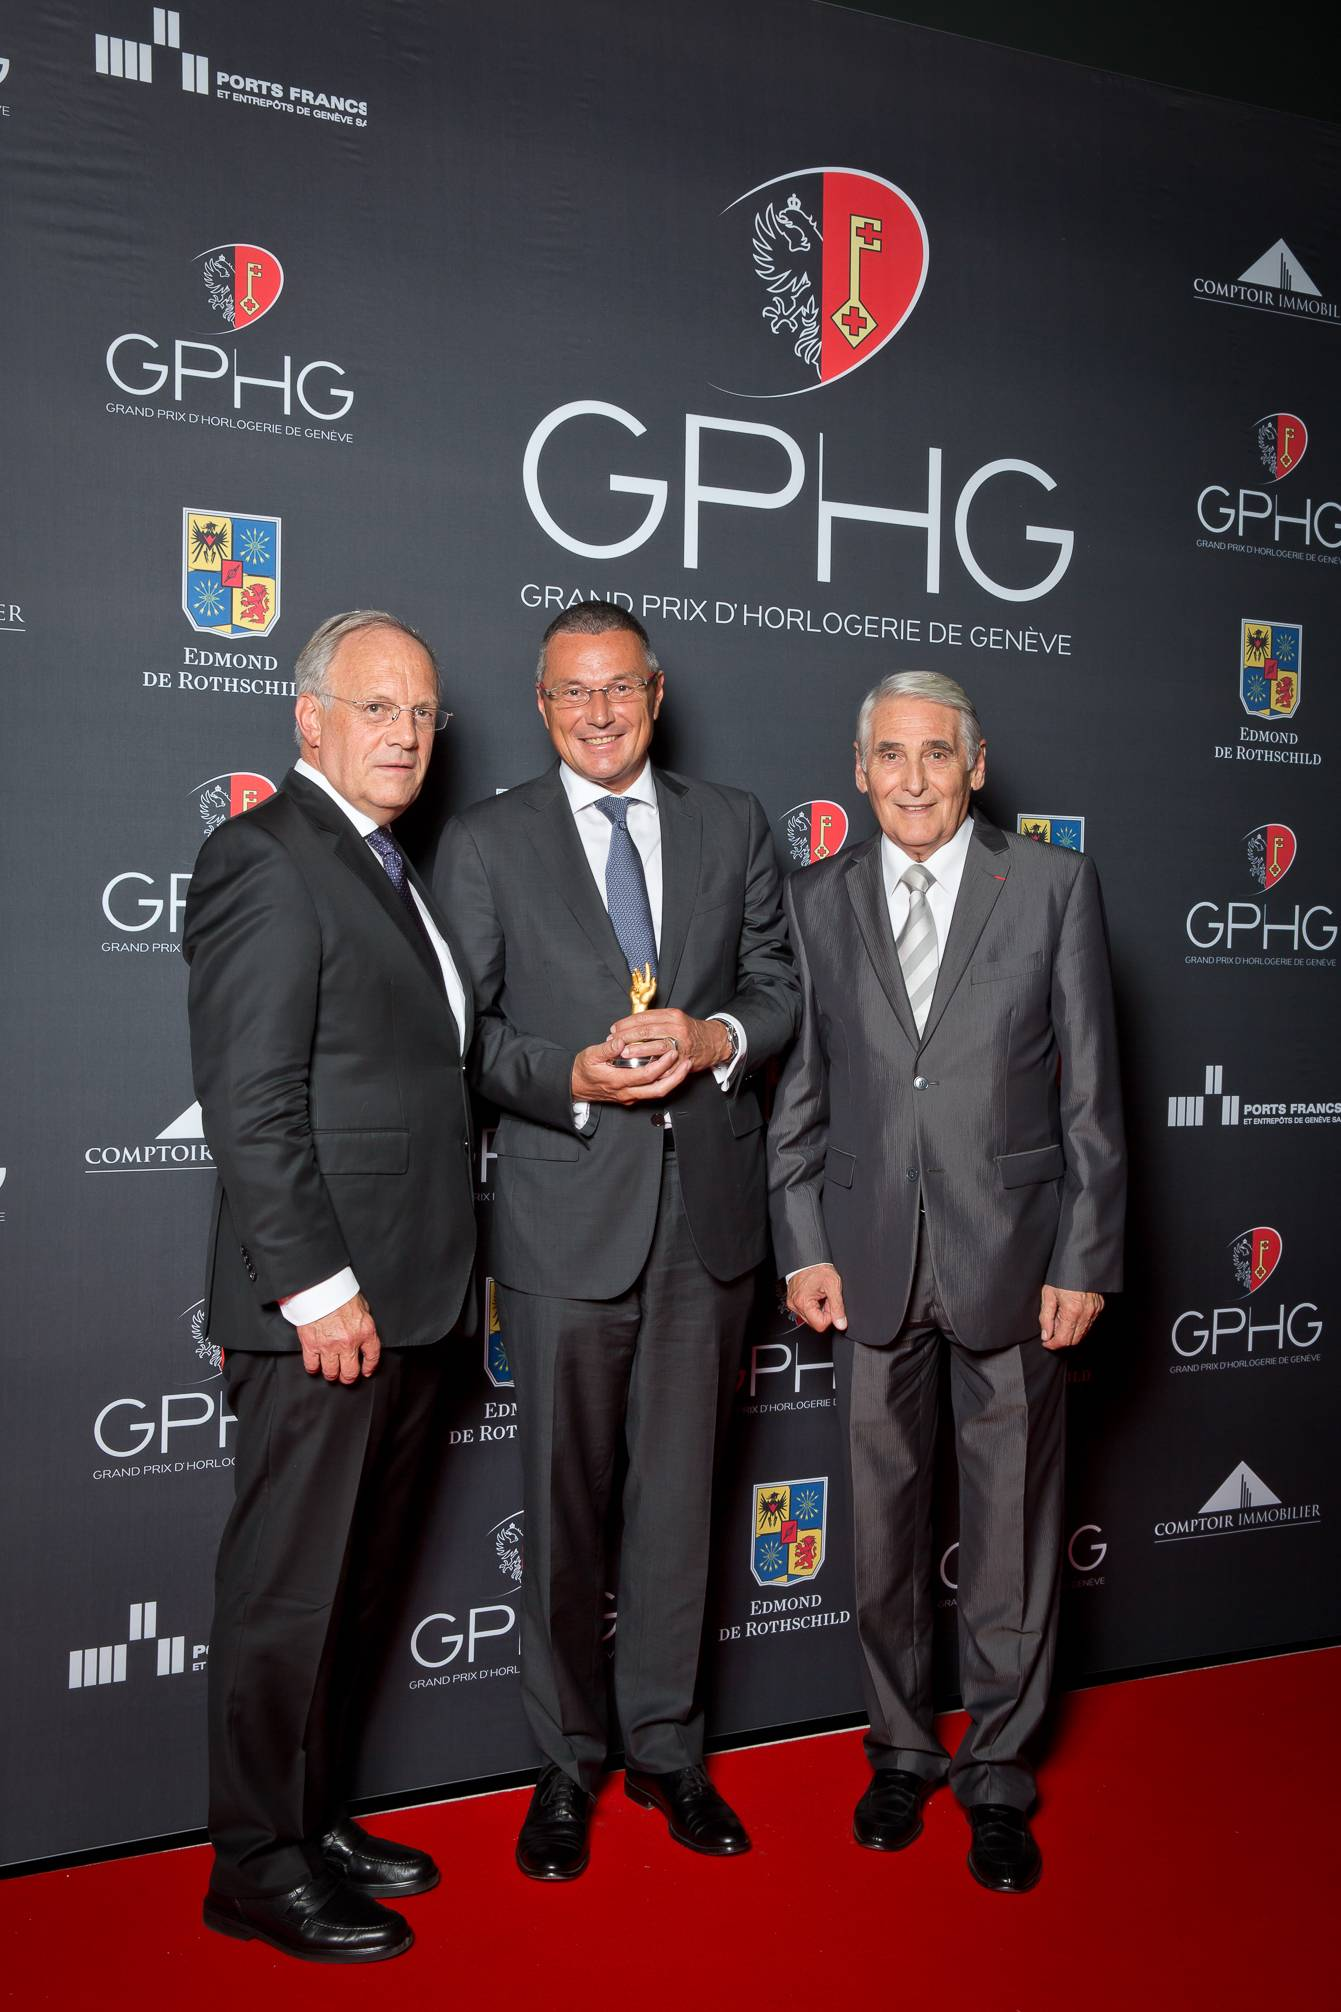 Johann Schneider-Ammann (Federal councillor), Jean-Christophe Babin (CEO of Bulgari, winner of the Jewellery Watch Prize 2014) and Carlo Lamprecht (President of the Foundation of the GPHG)